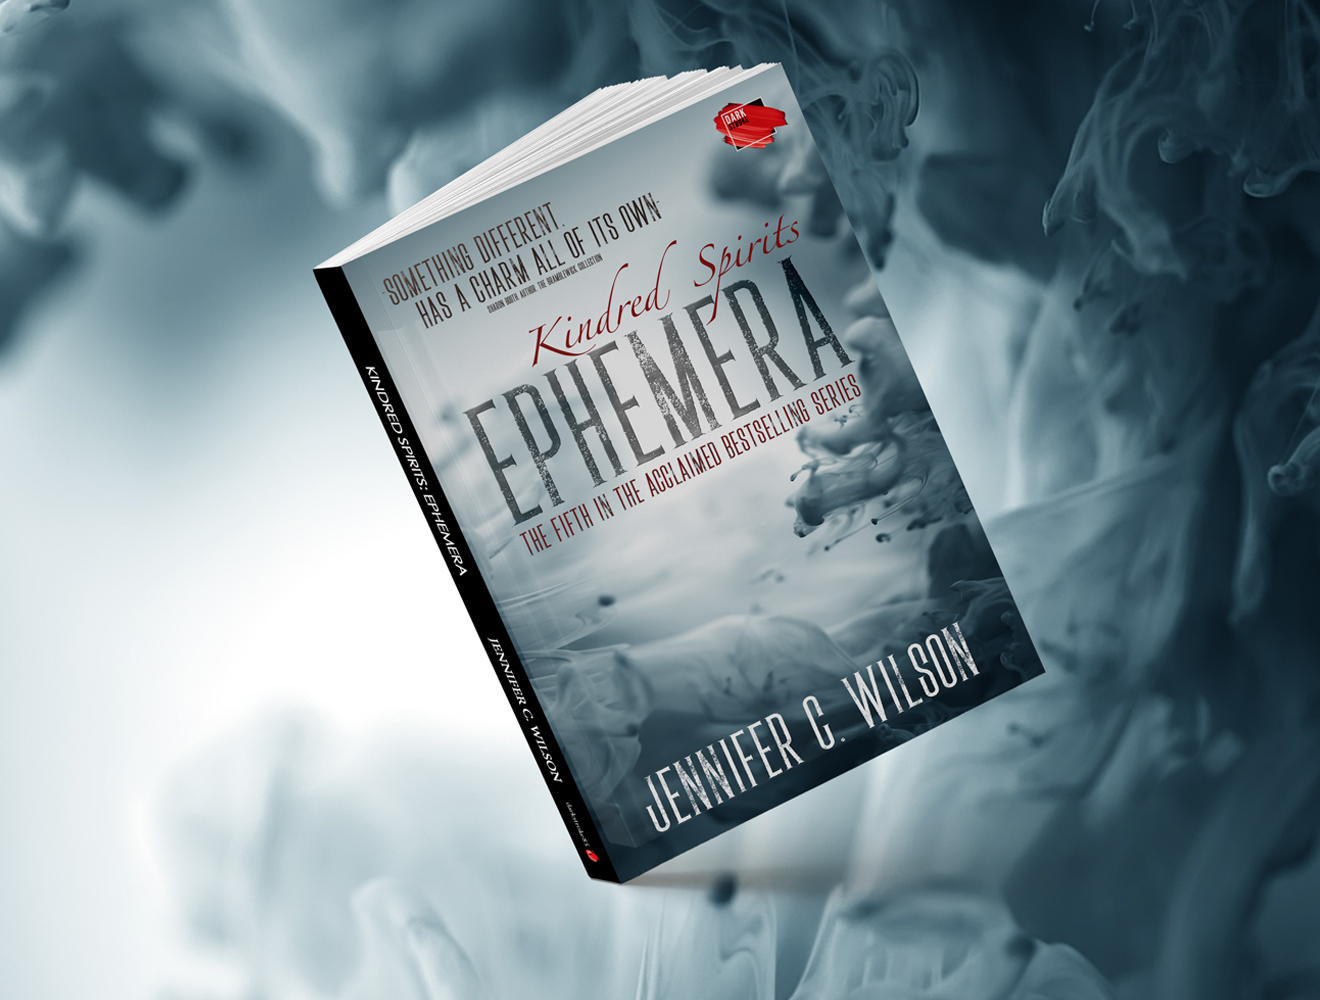 Kindred Spirits: Ephemera